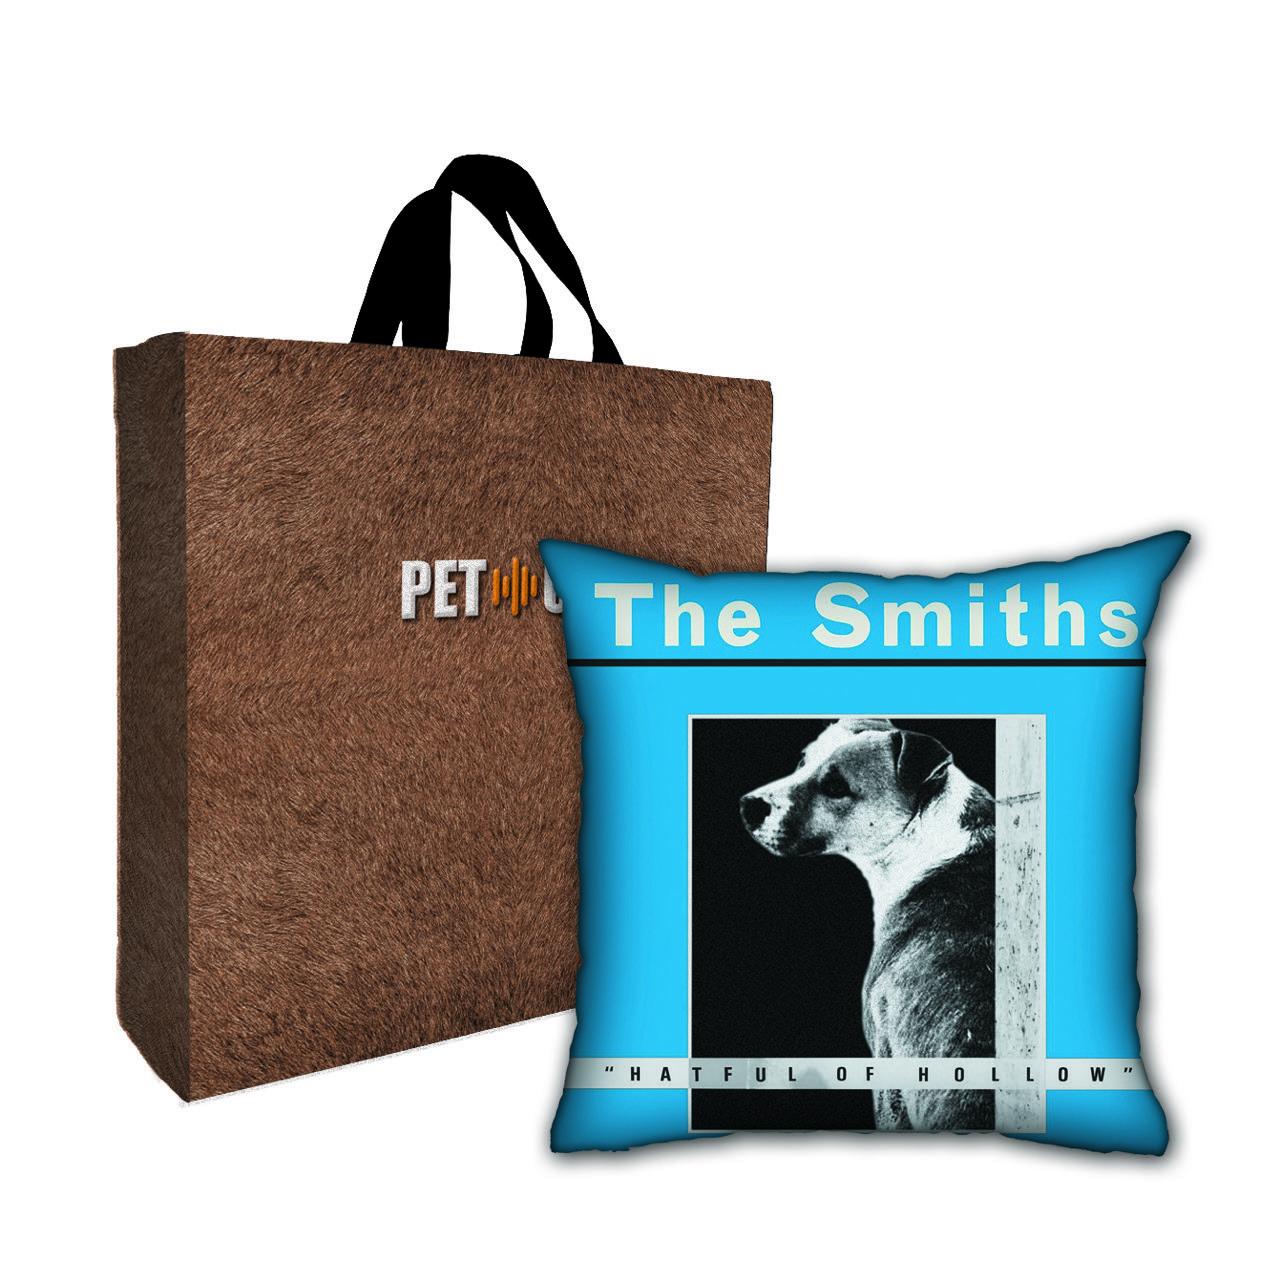 Kit Almofada & Sacola Bege Pet Use - The Dogths - Cachorro